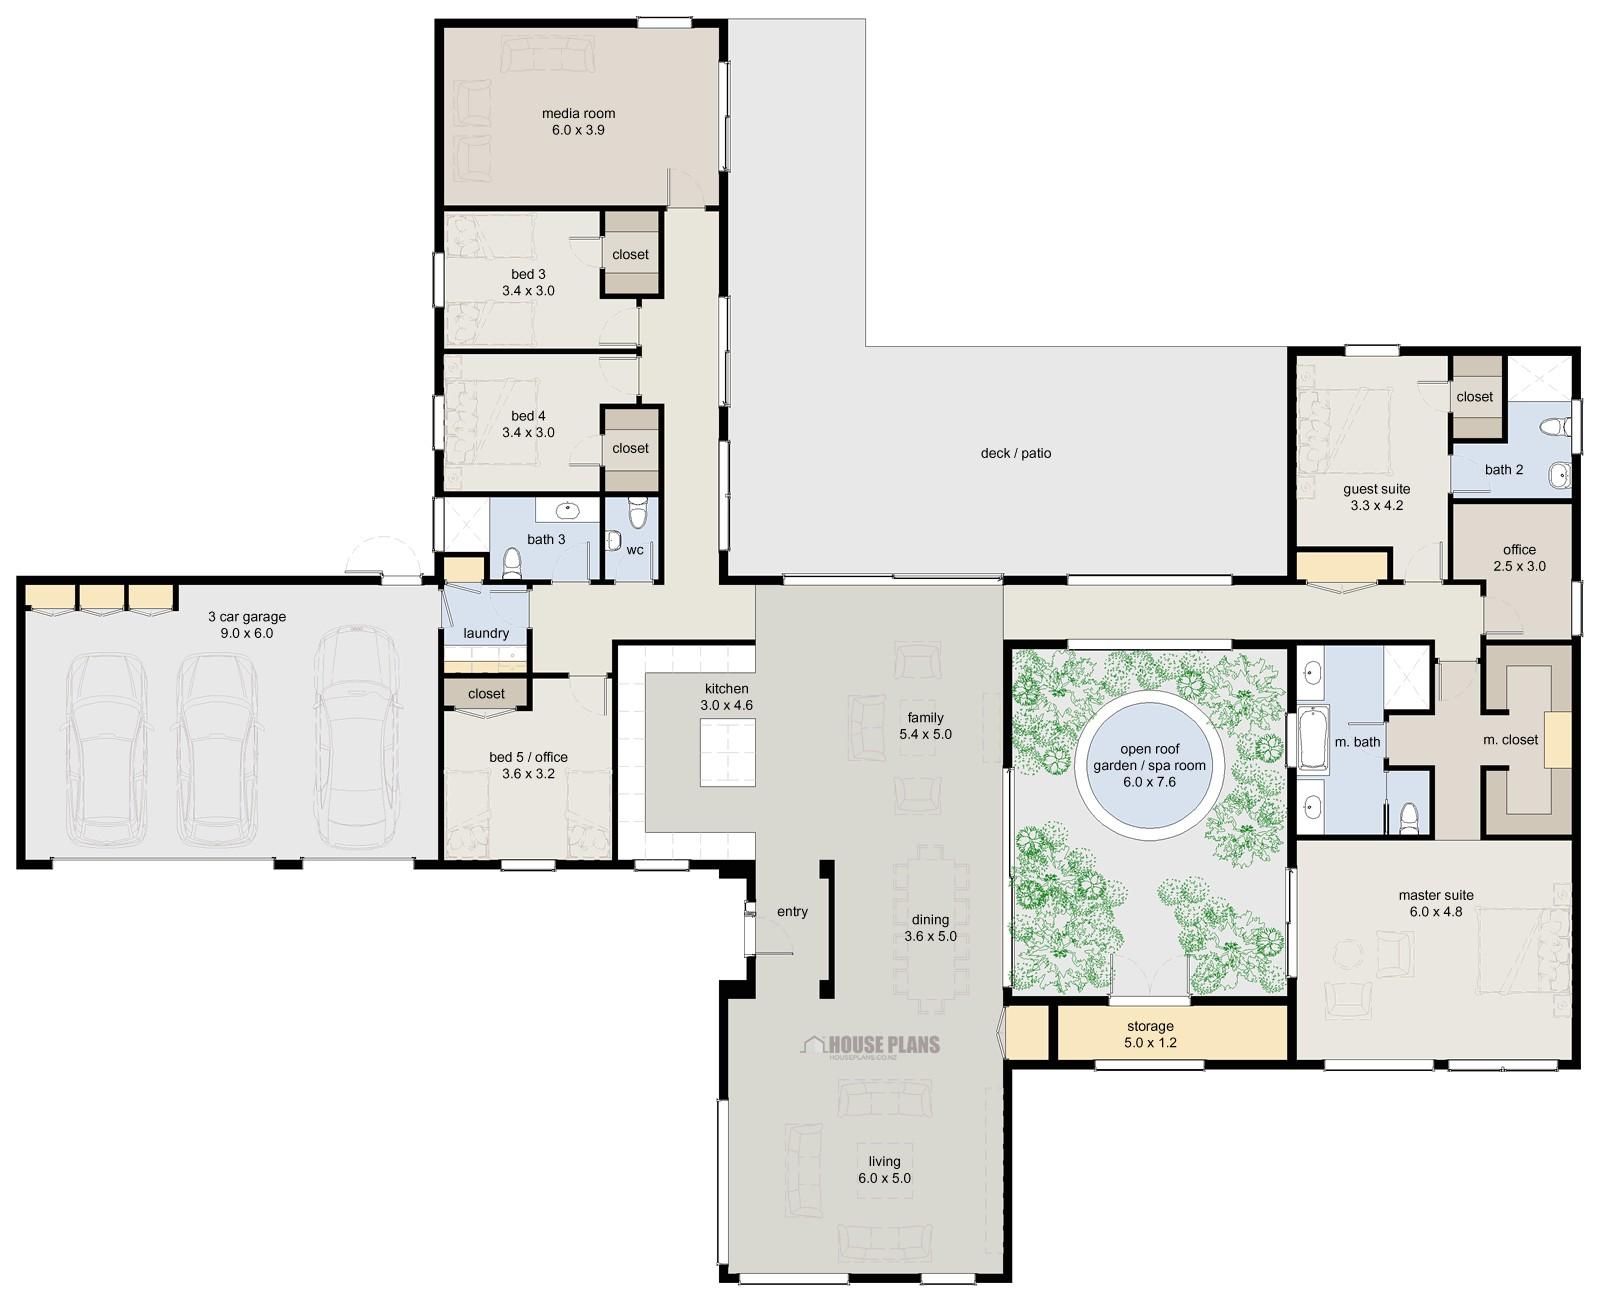 Home Design Plans Zen Lifestyle 5 5 Bedroom House Plans New Zealand Ltd